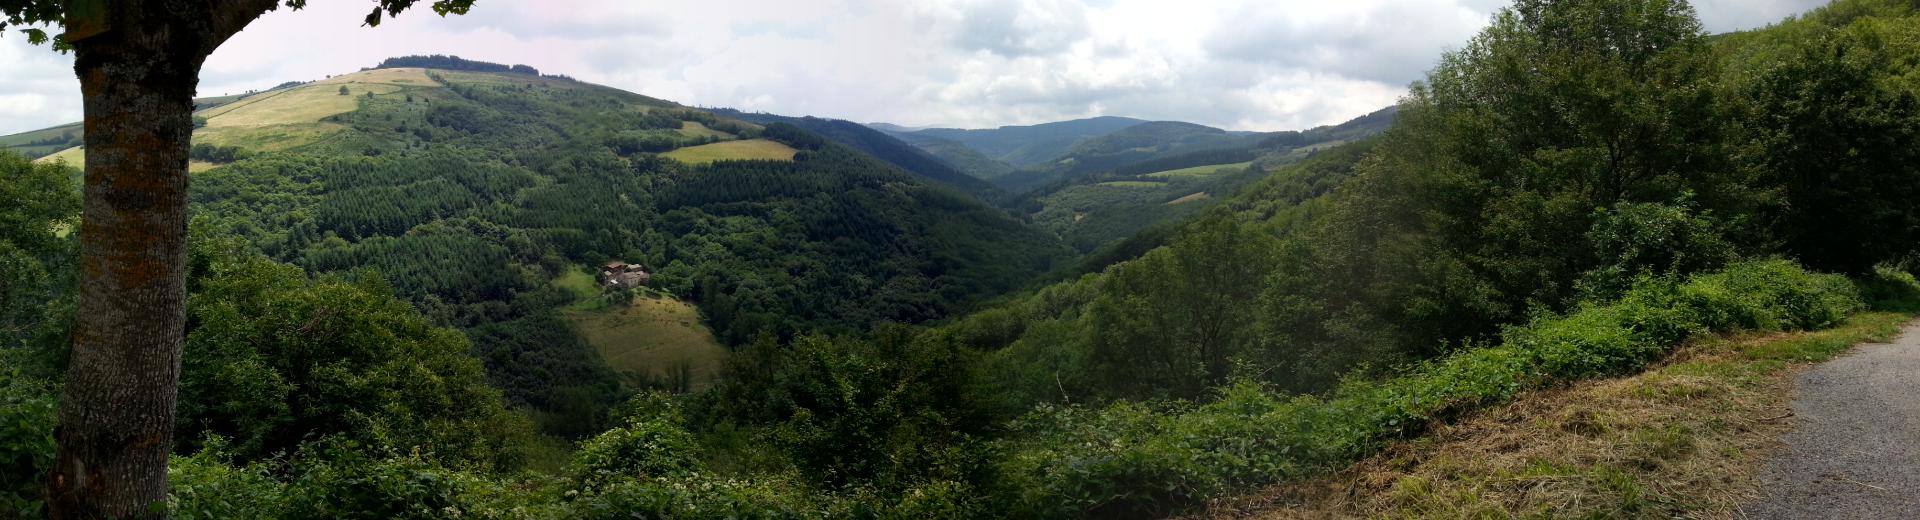 Toudoure valley